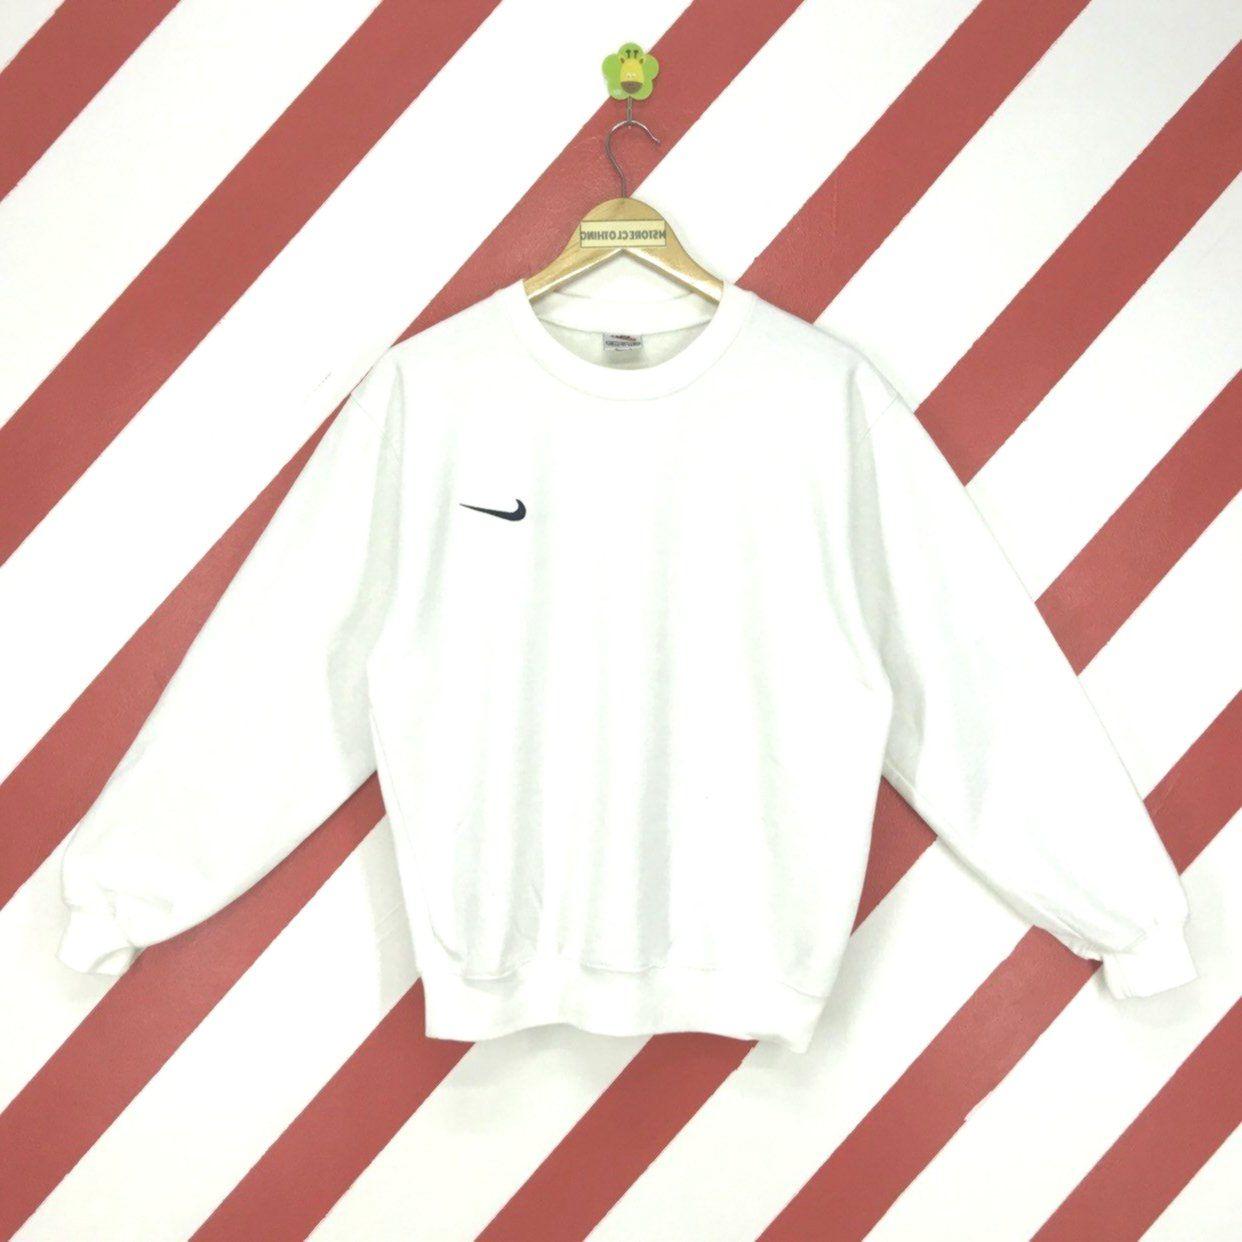 Vintage 90s Nike Sweatshirt Crewneck Nike Swoosh Pullover Nike Air Sportswear Jumper Nike Activewear Embroidery Logo [ 1242 x 1242 Pixel ]